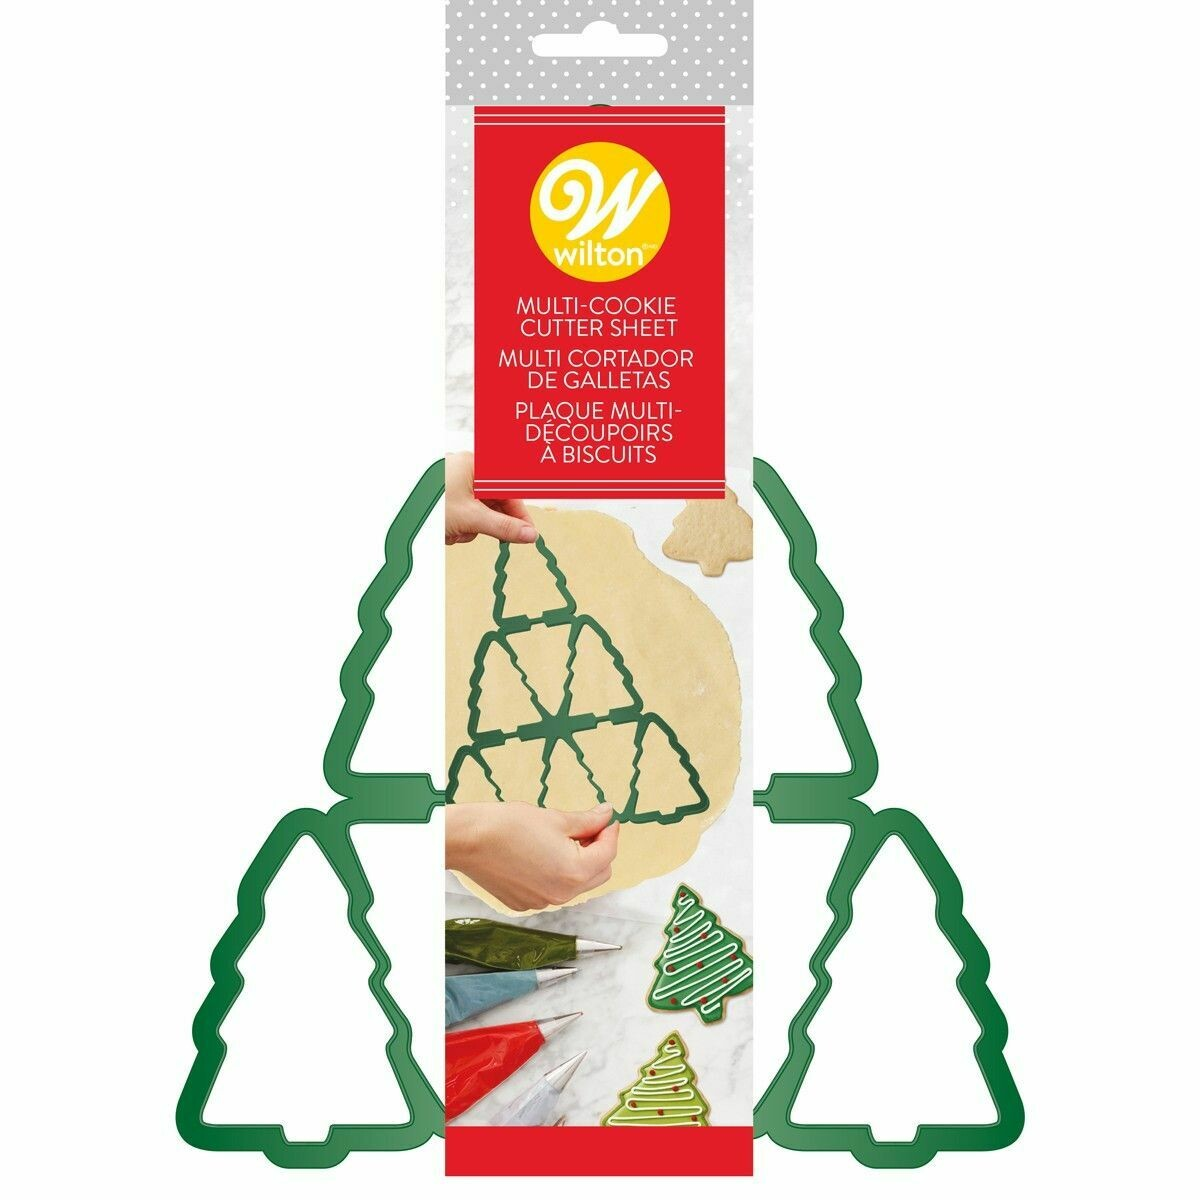 SALE!!! Wilton Multi Cookie Cutter Tree - Πολλαπλό κουπ πατ Χριστουγεννιάτικα Δέντρα